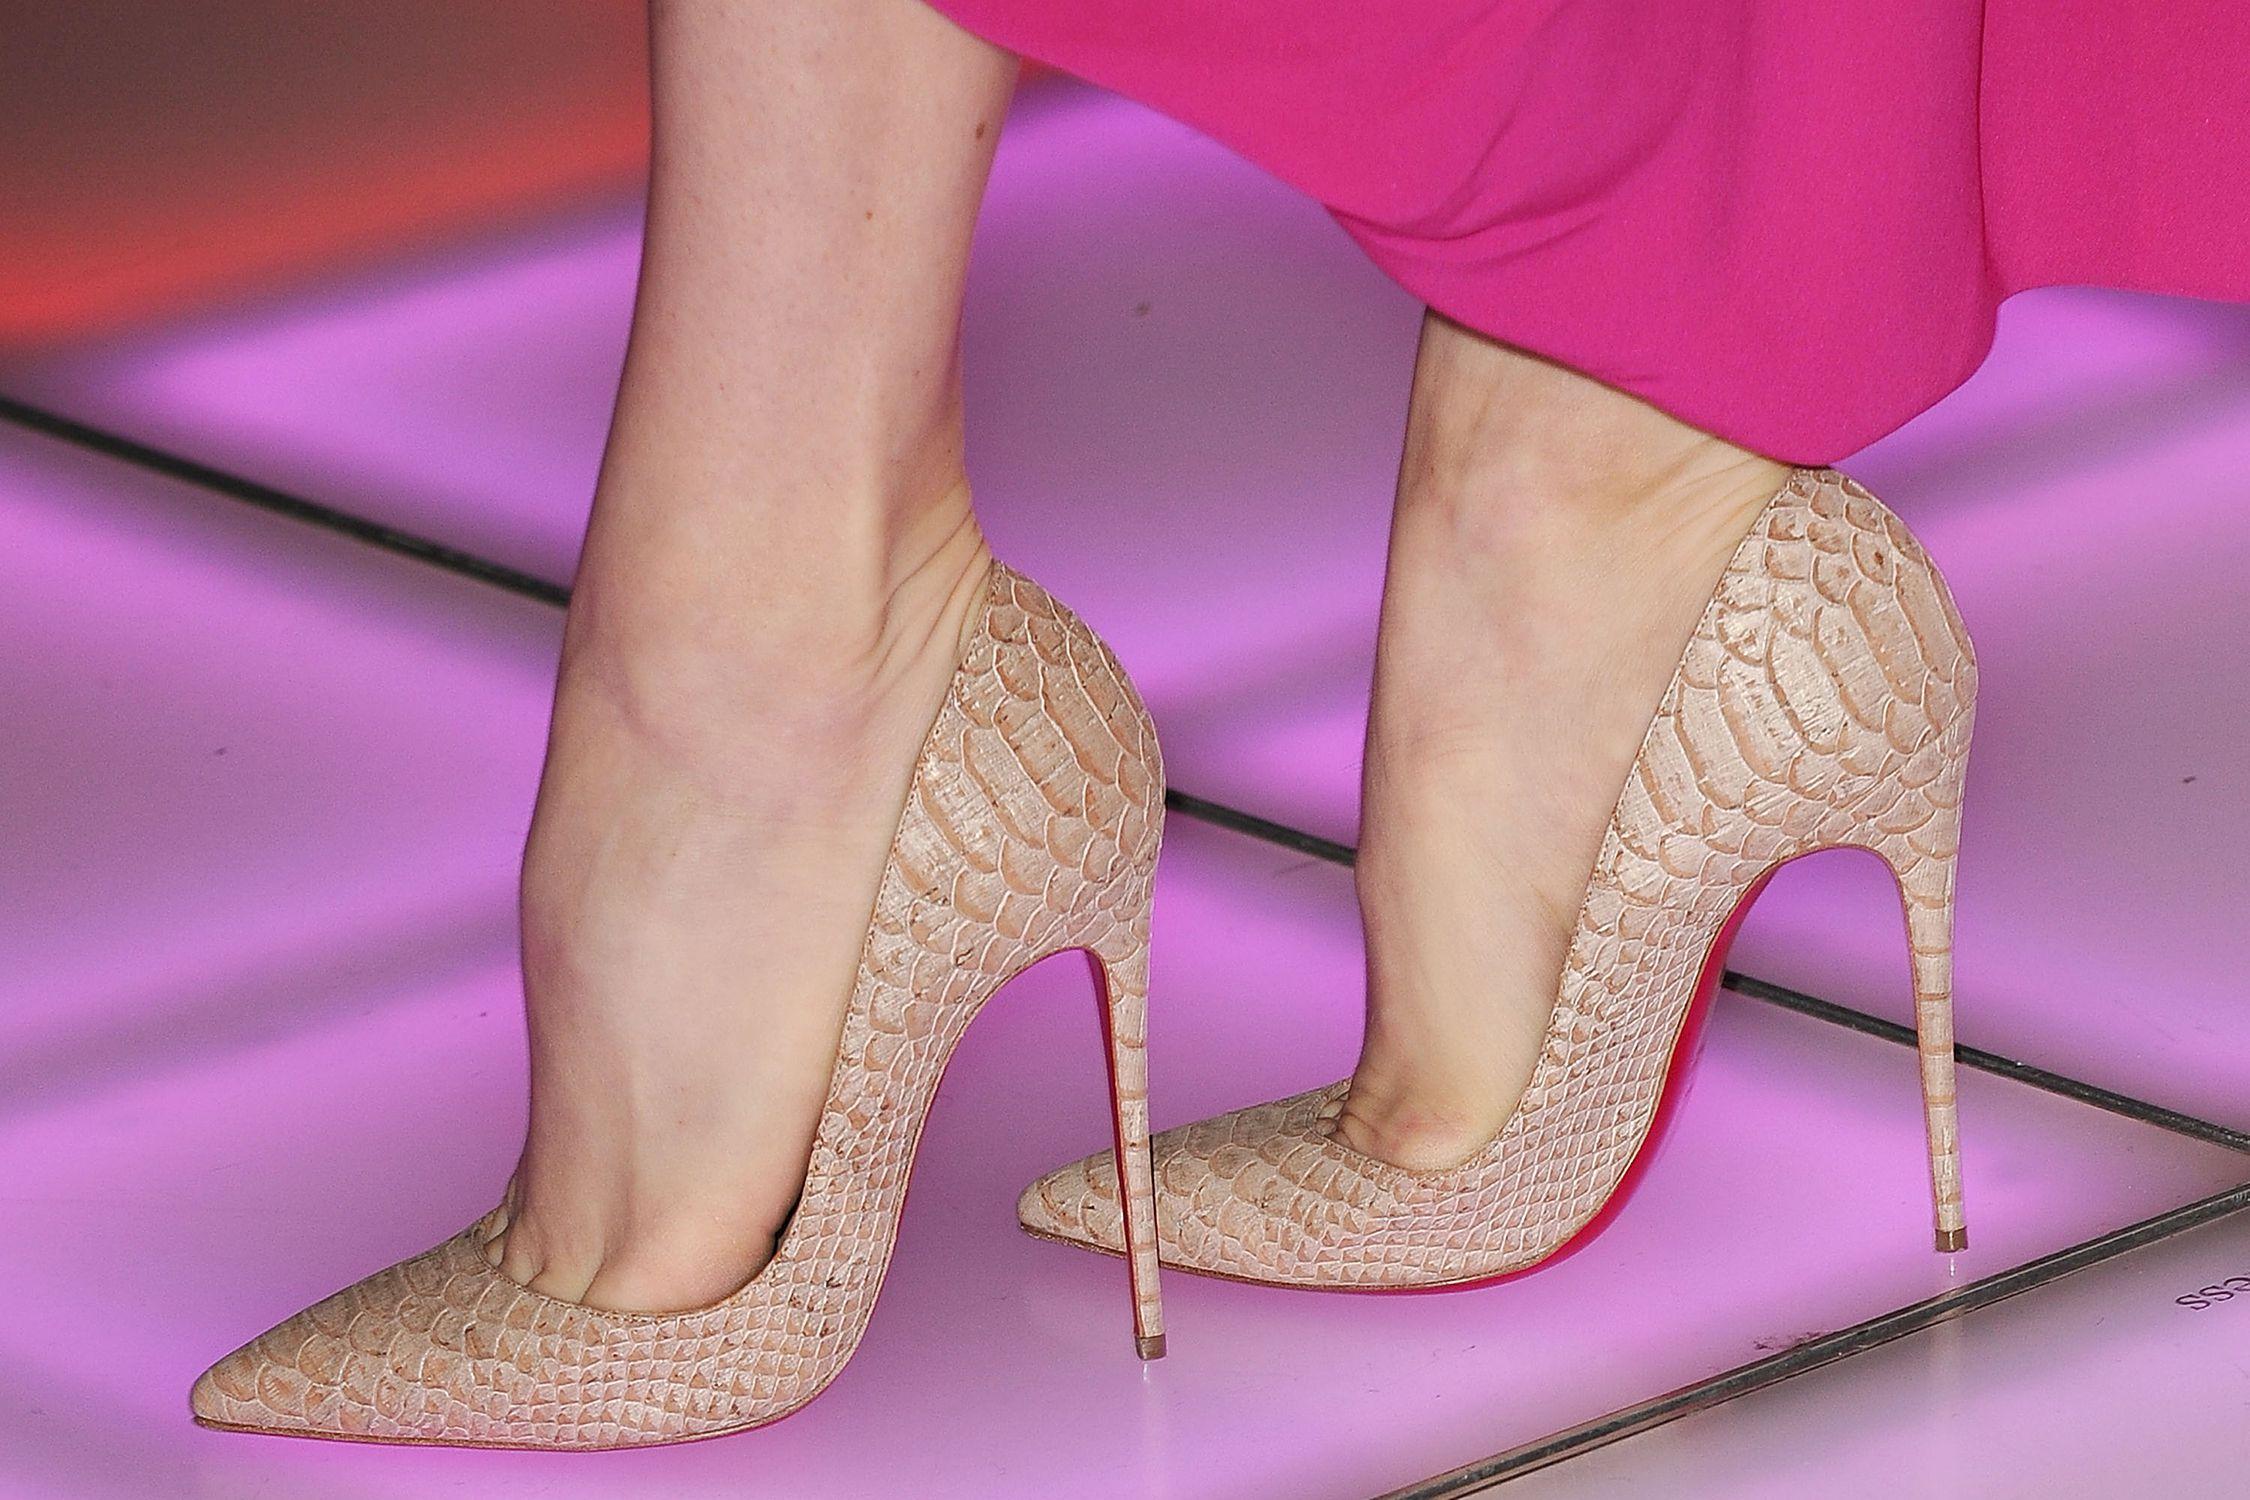 397d977e8bc Colors that Go Best with Neutral Shoes